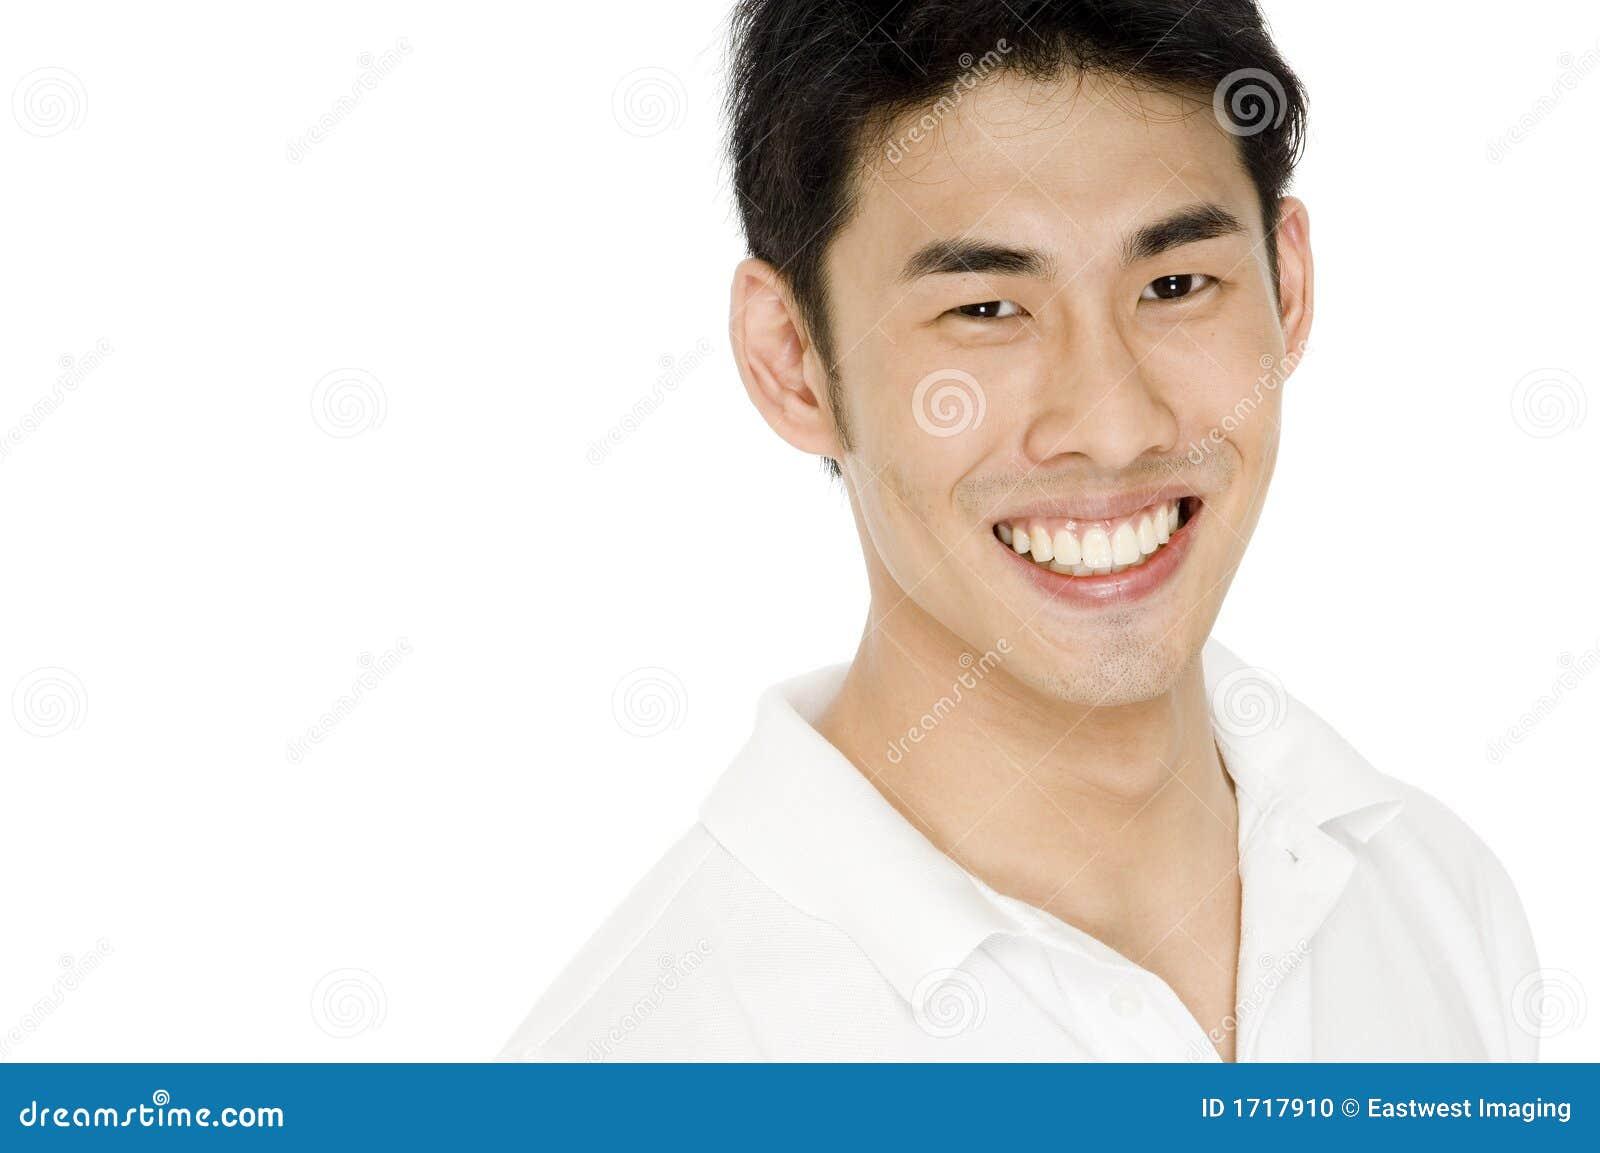 Http Www Dreamstime Com Stock Photo Asian Man Image1717910